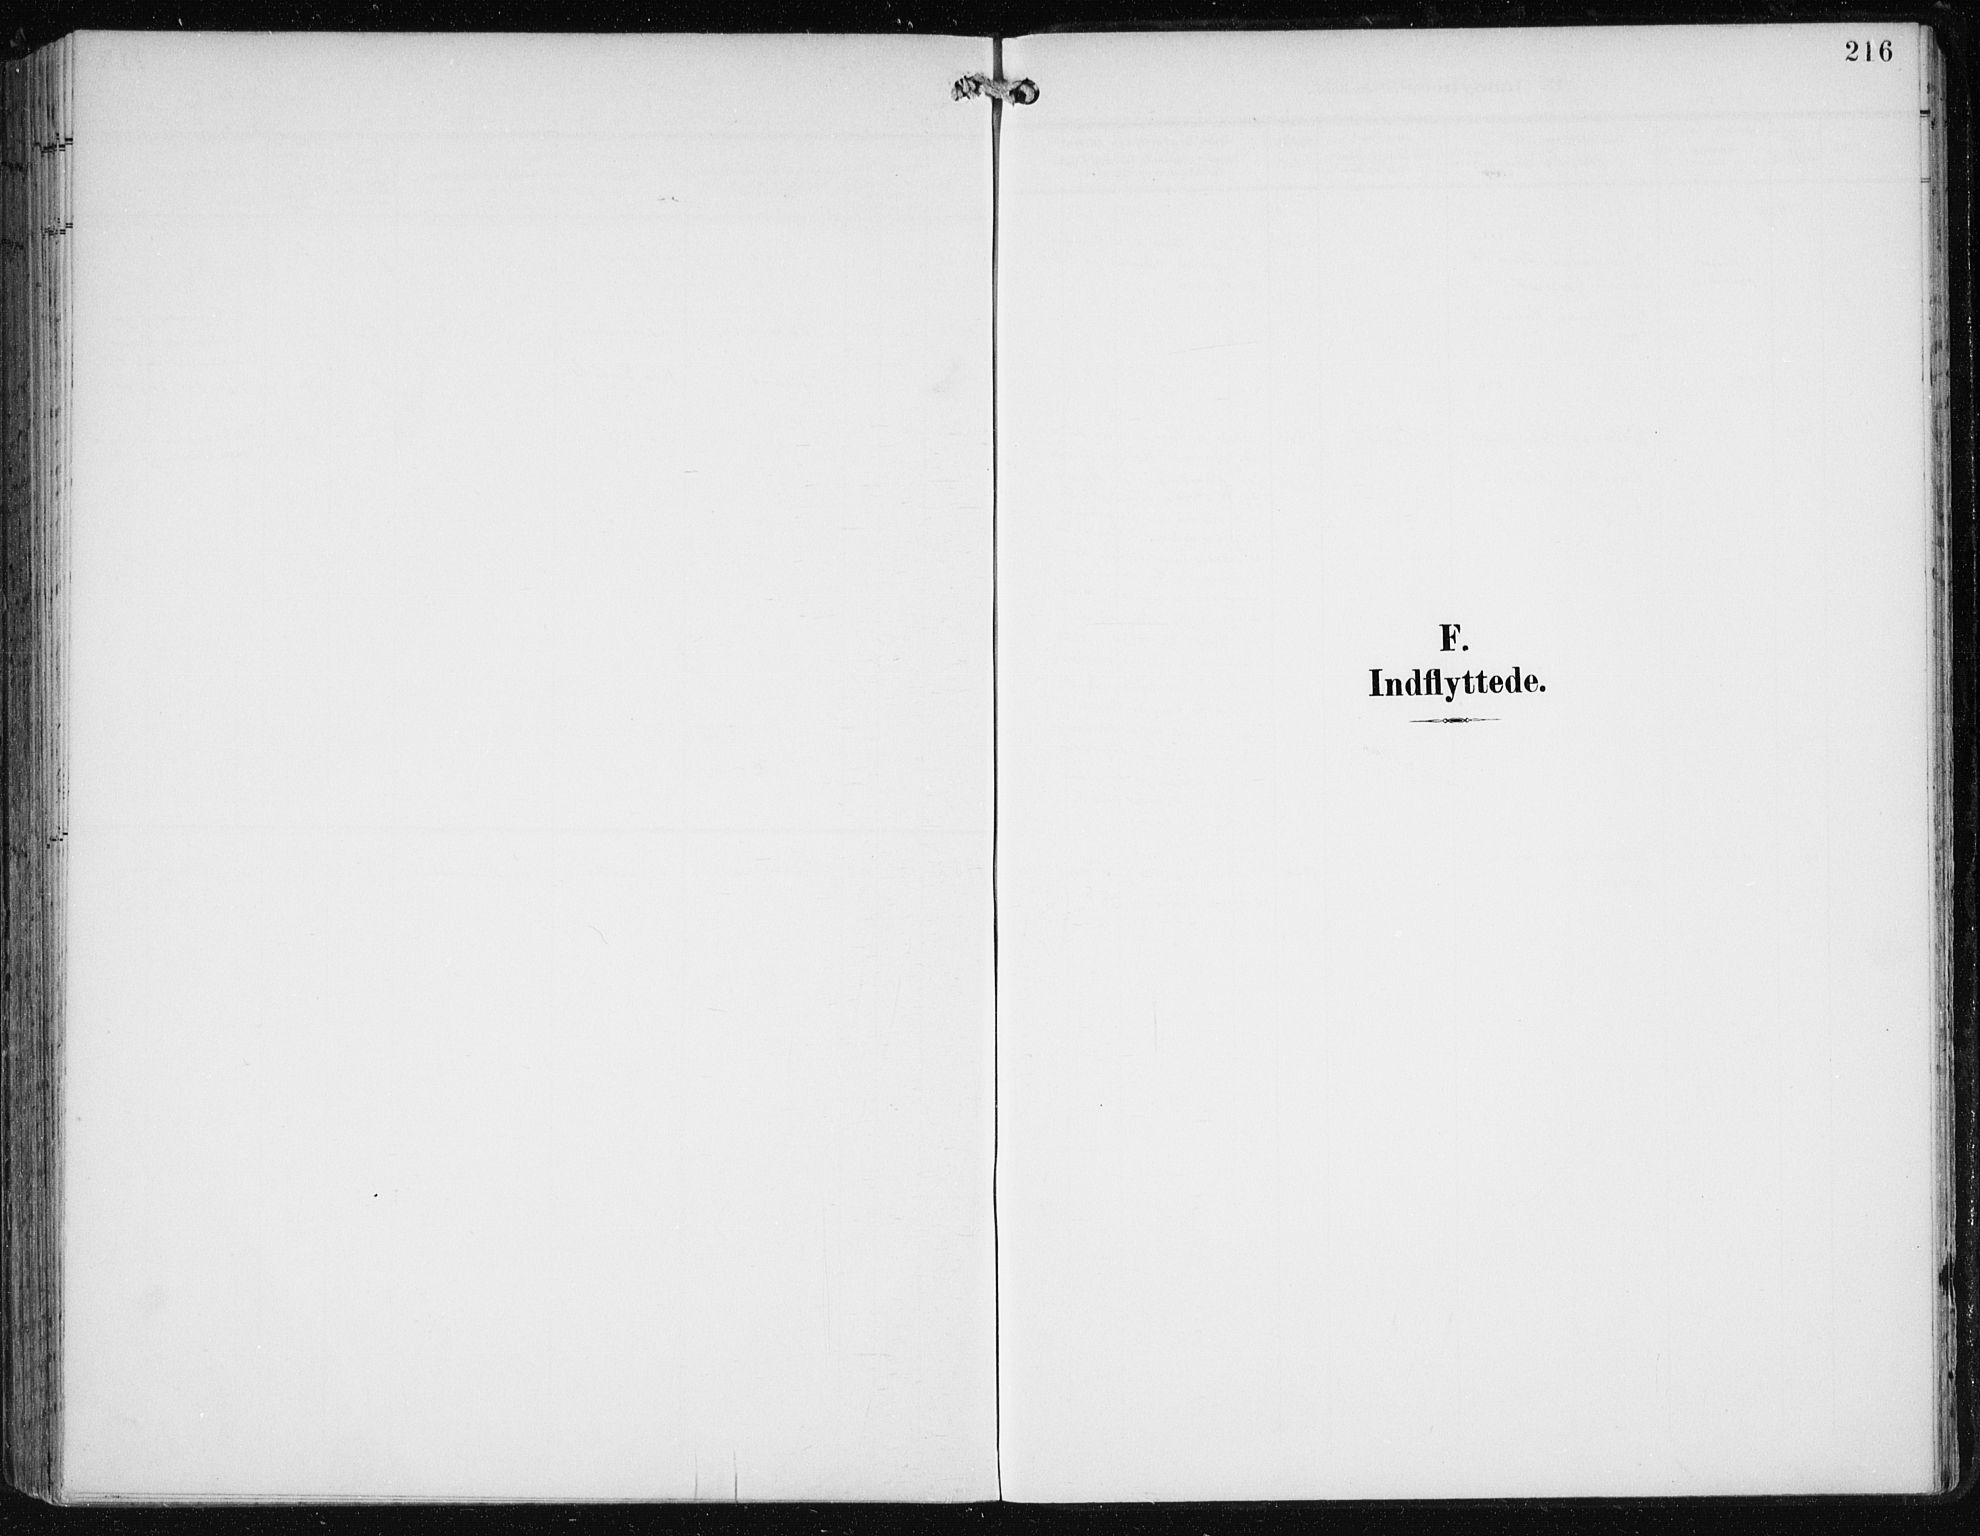 SAB, Fana Sokneprestembete, H/Haa/Haai/L0003: Ministerialbok nr. I 3, 1900-1912, s. 216